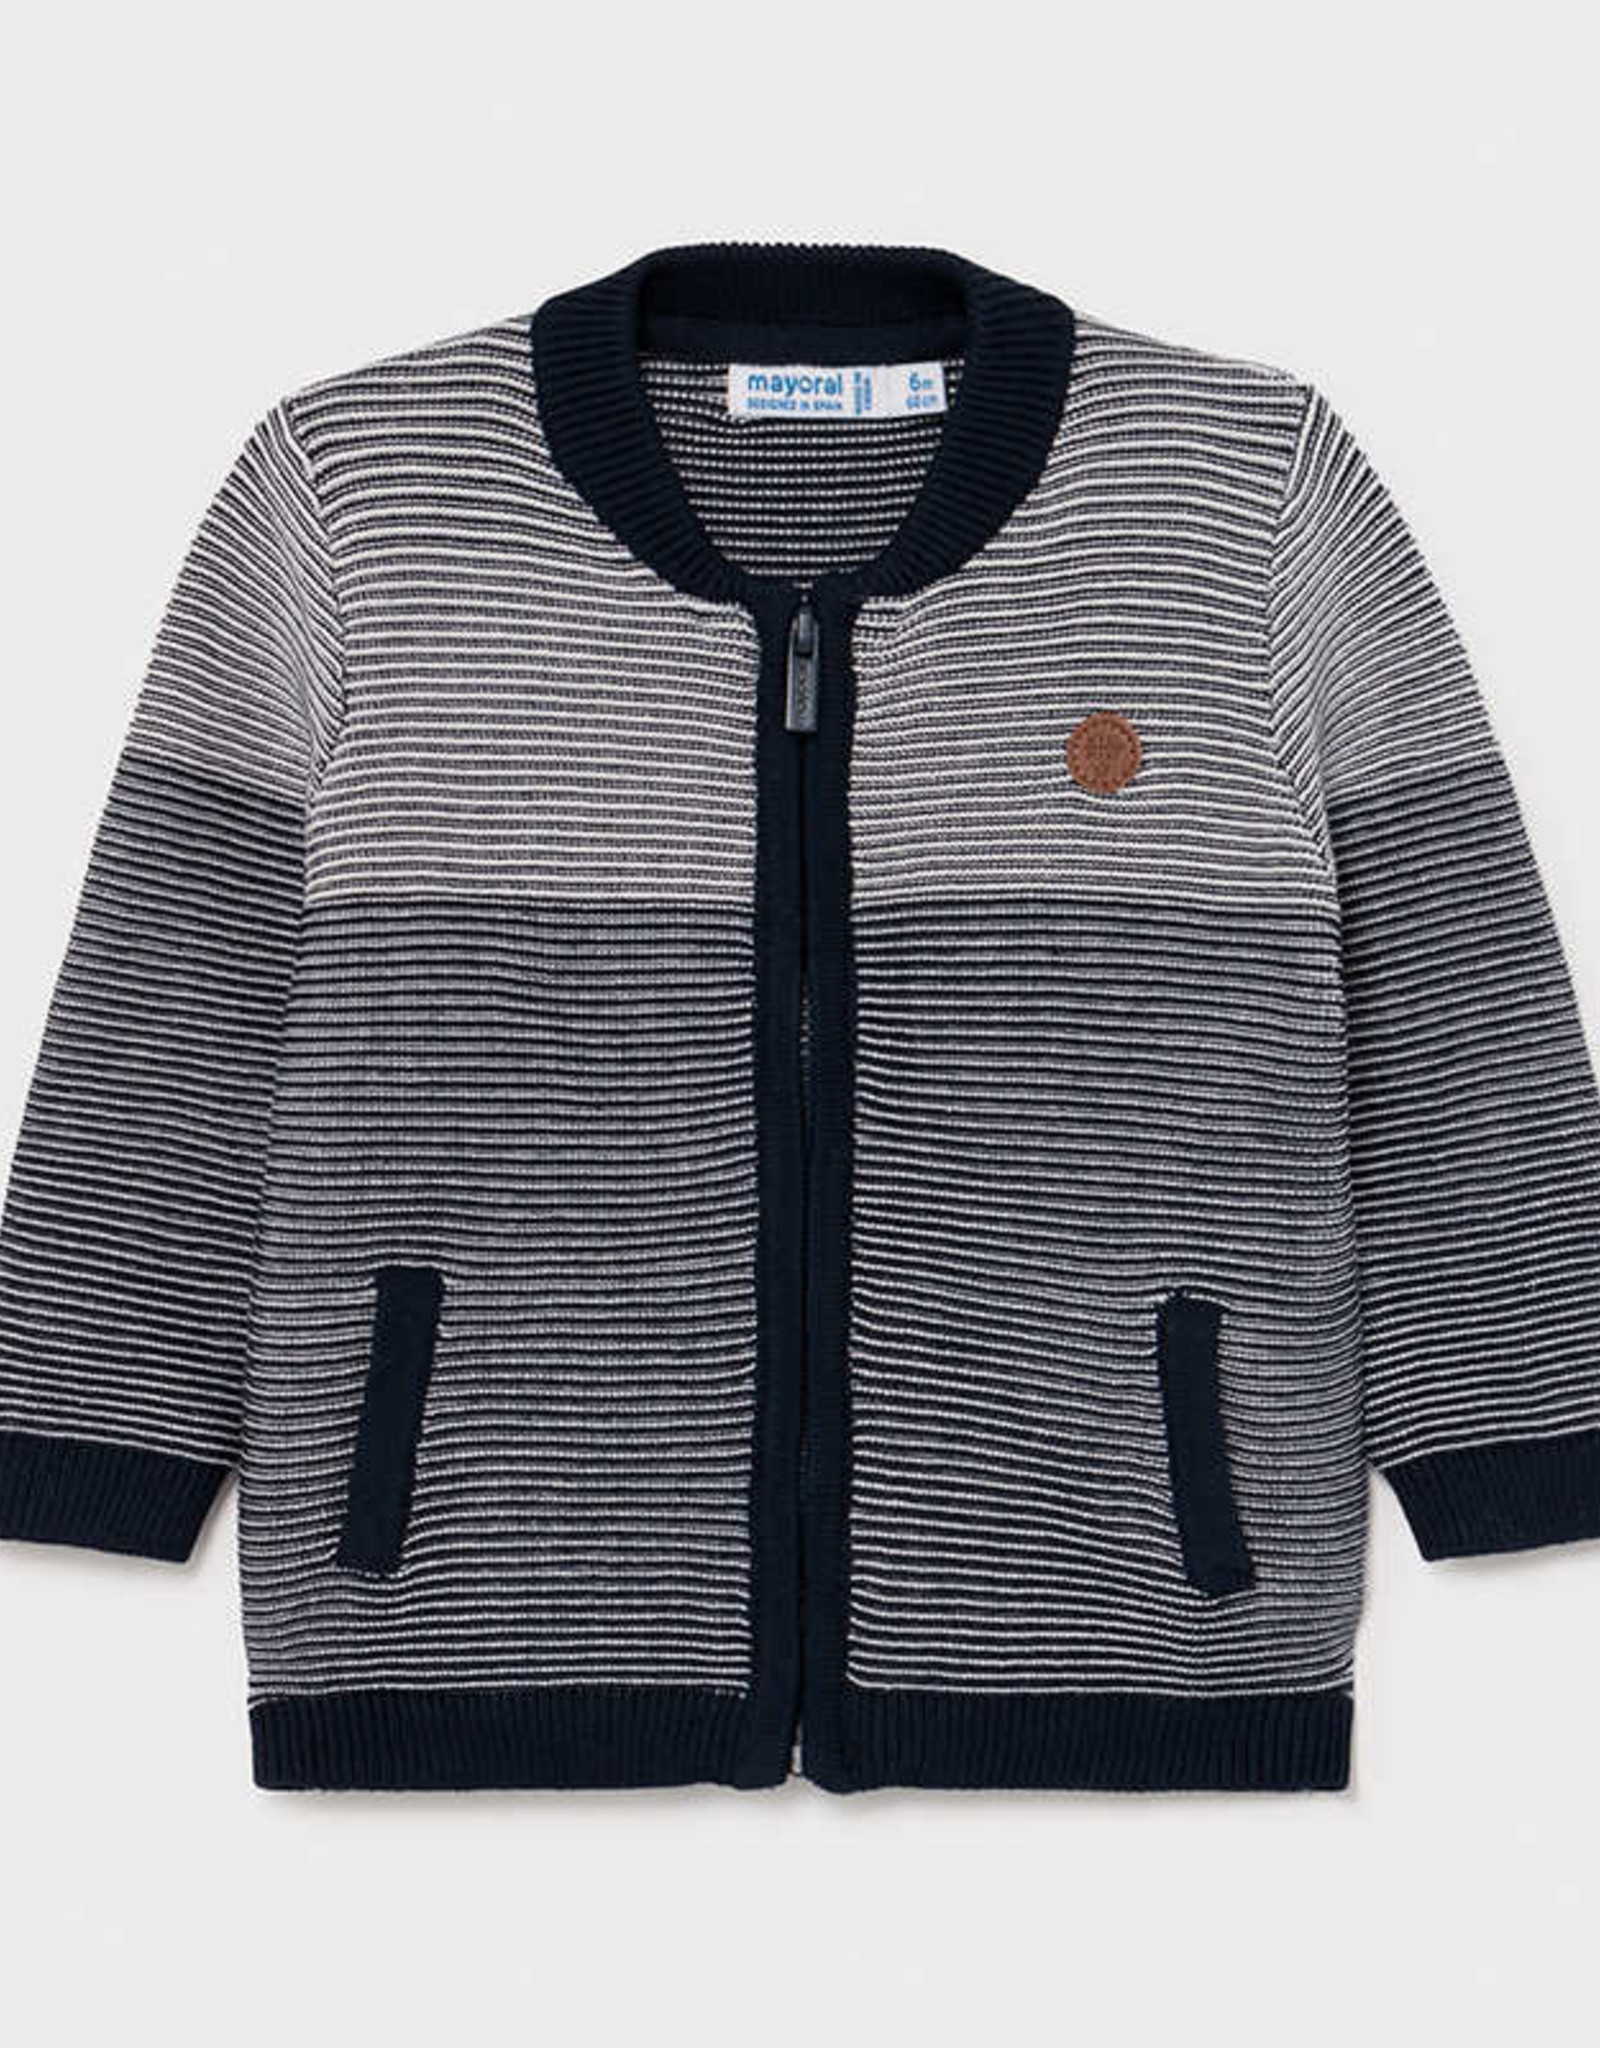 Mayoral SP21 BbyB Navy Zip Sweater